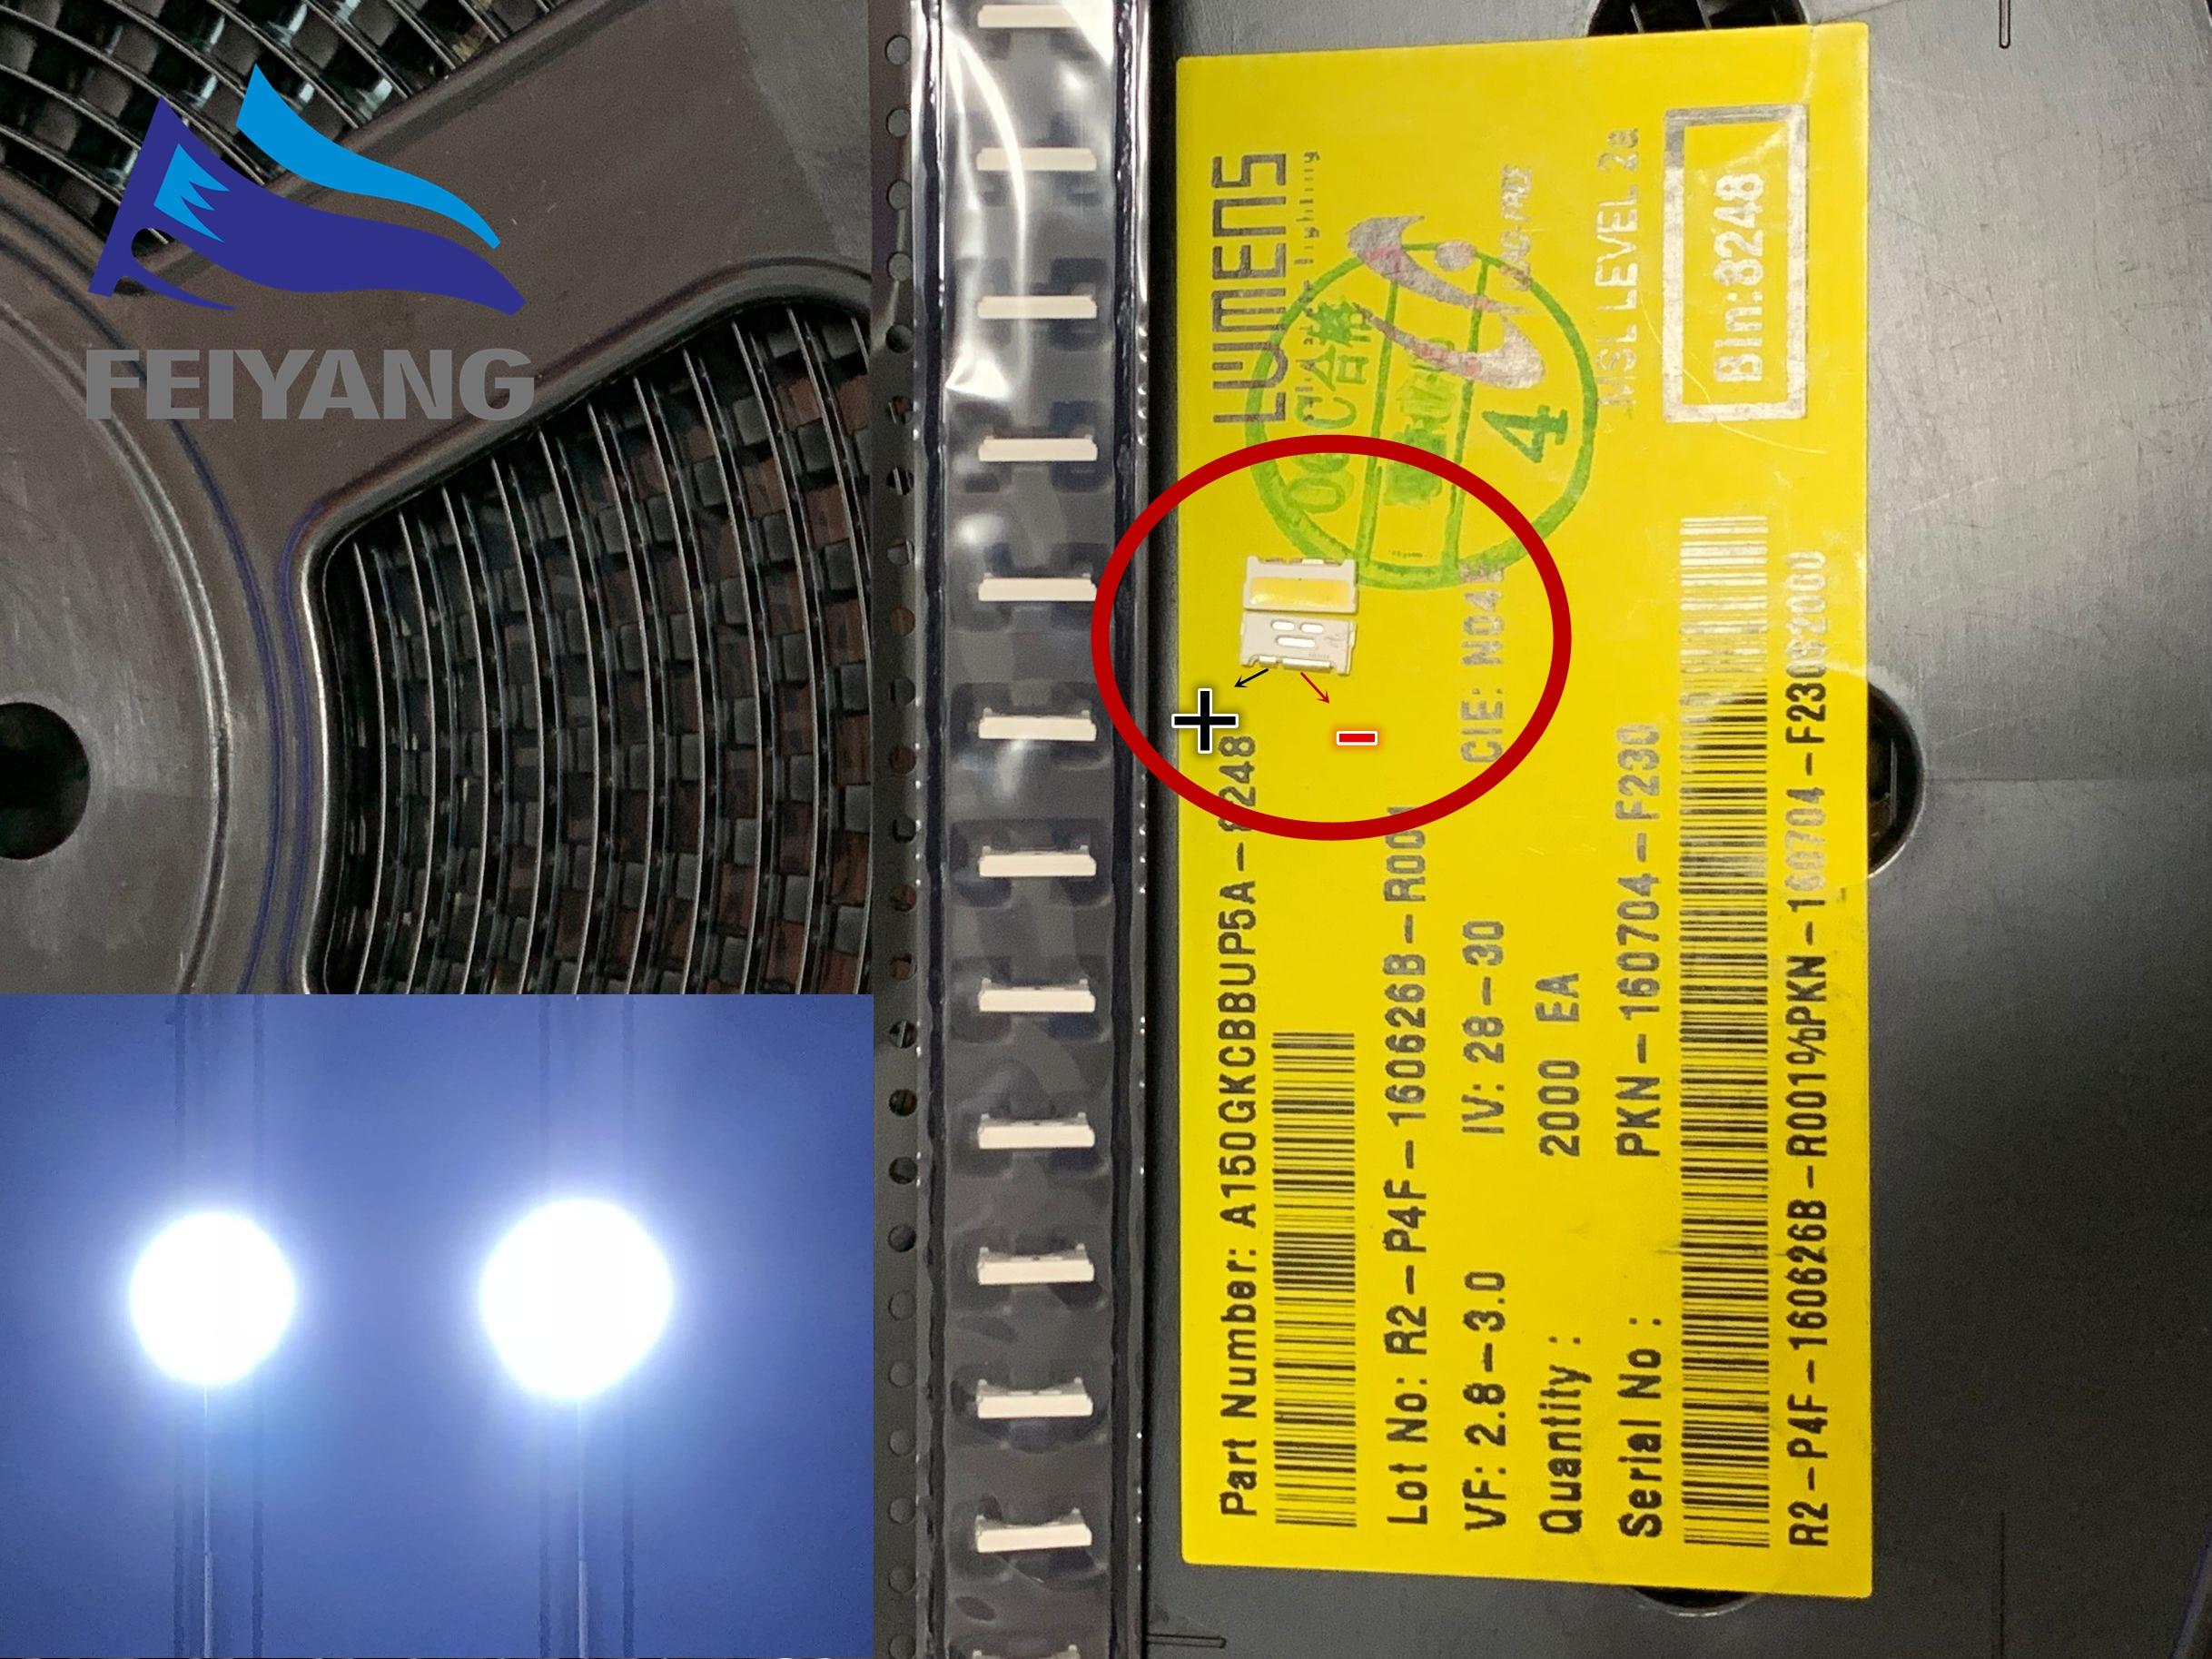 100pcs LUMENS LED Backlight Edge LED Series 0.7W 3V 7032 Cool white For SAMSUNG LED LCD Backlight TV Applicatio A150GKCBBUP5A